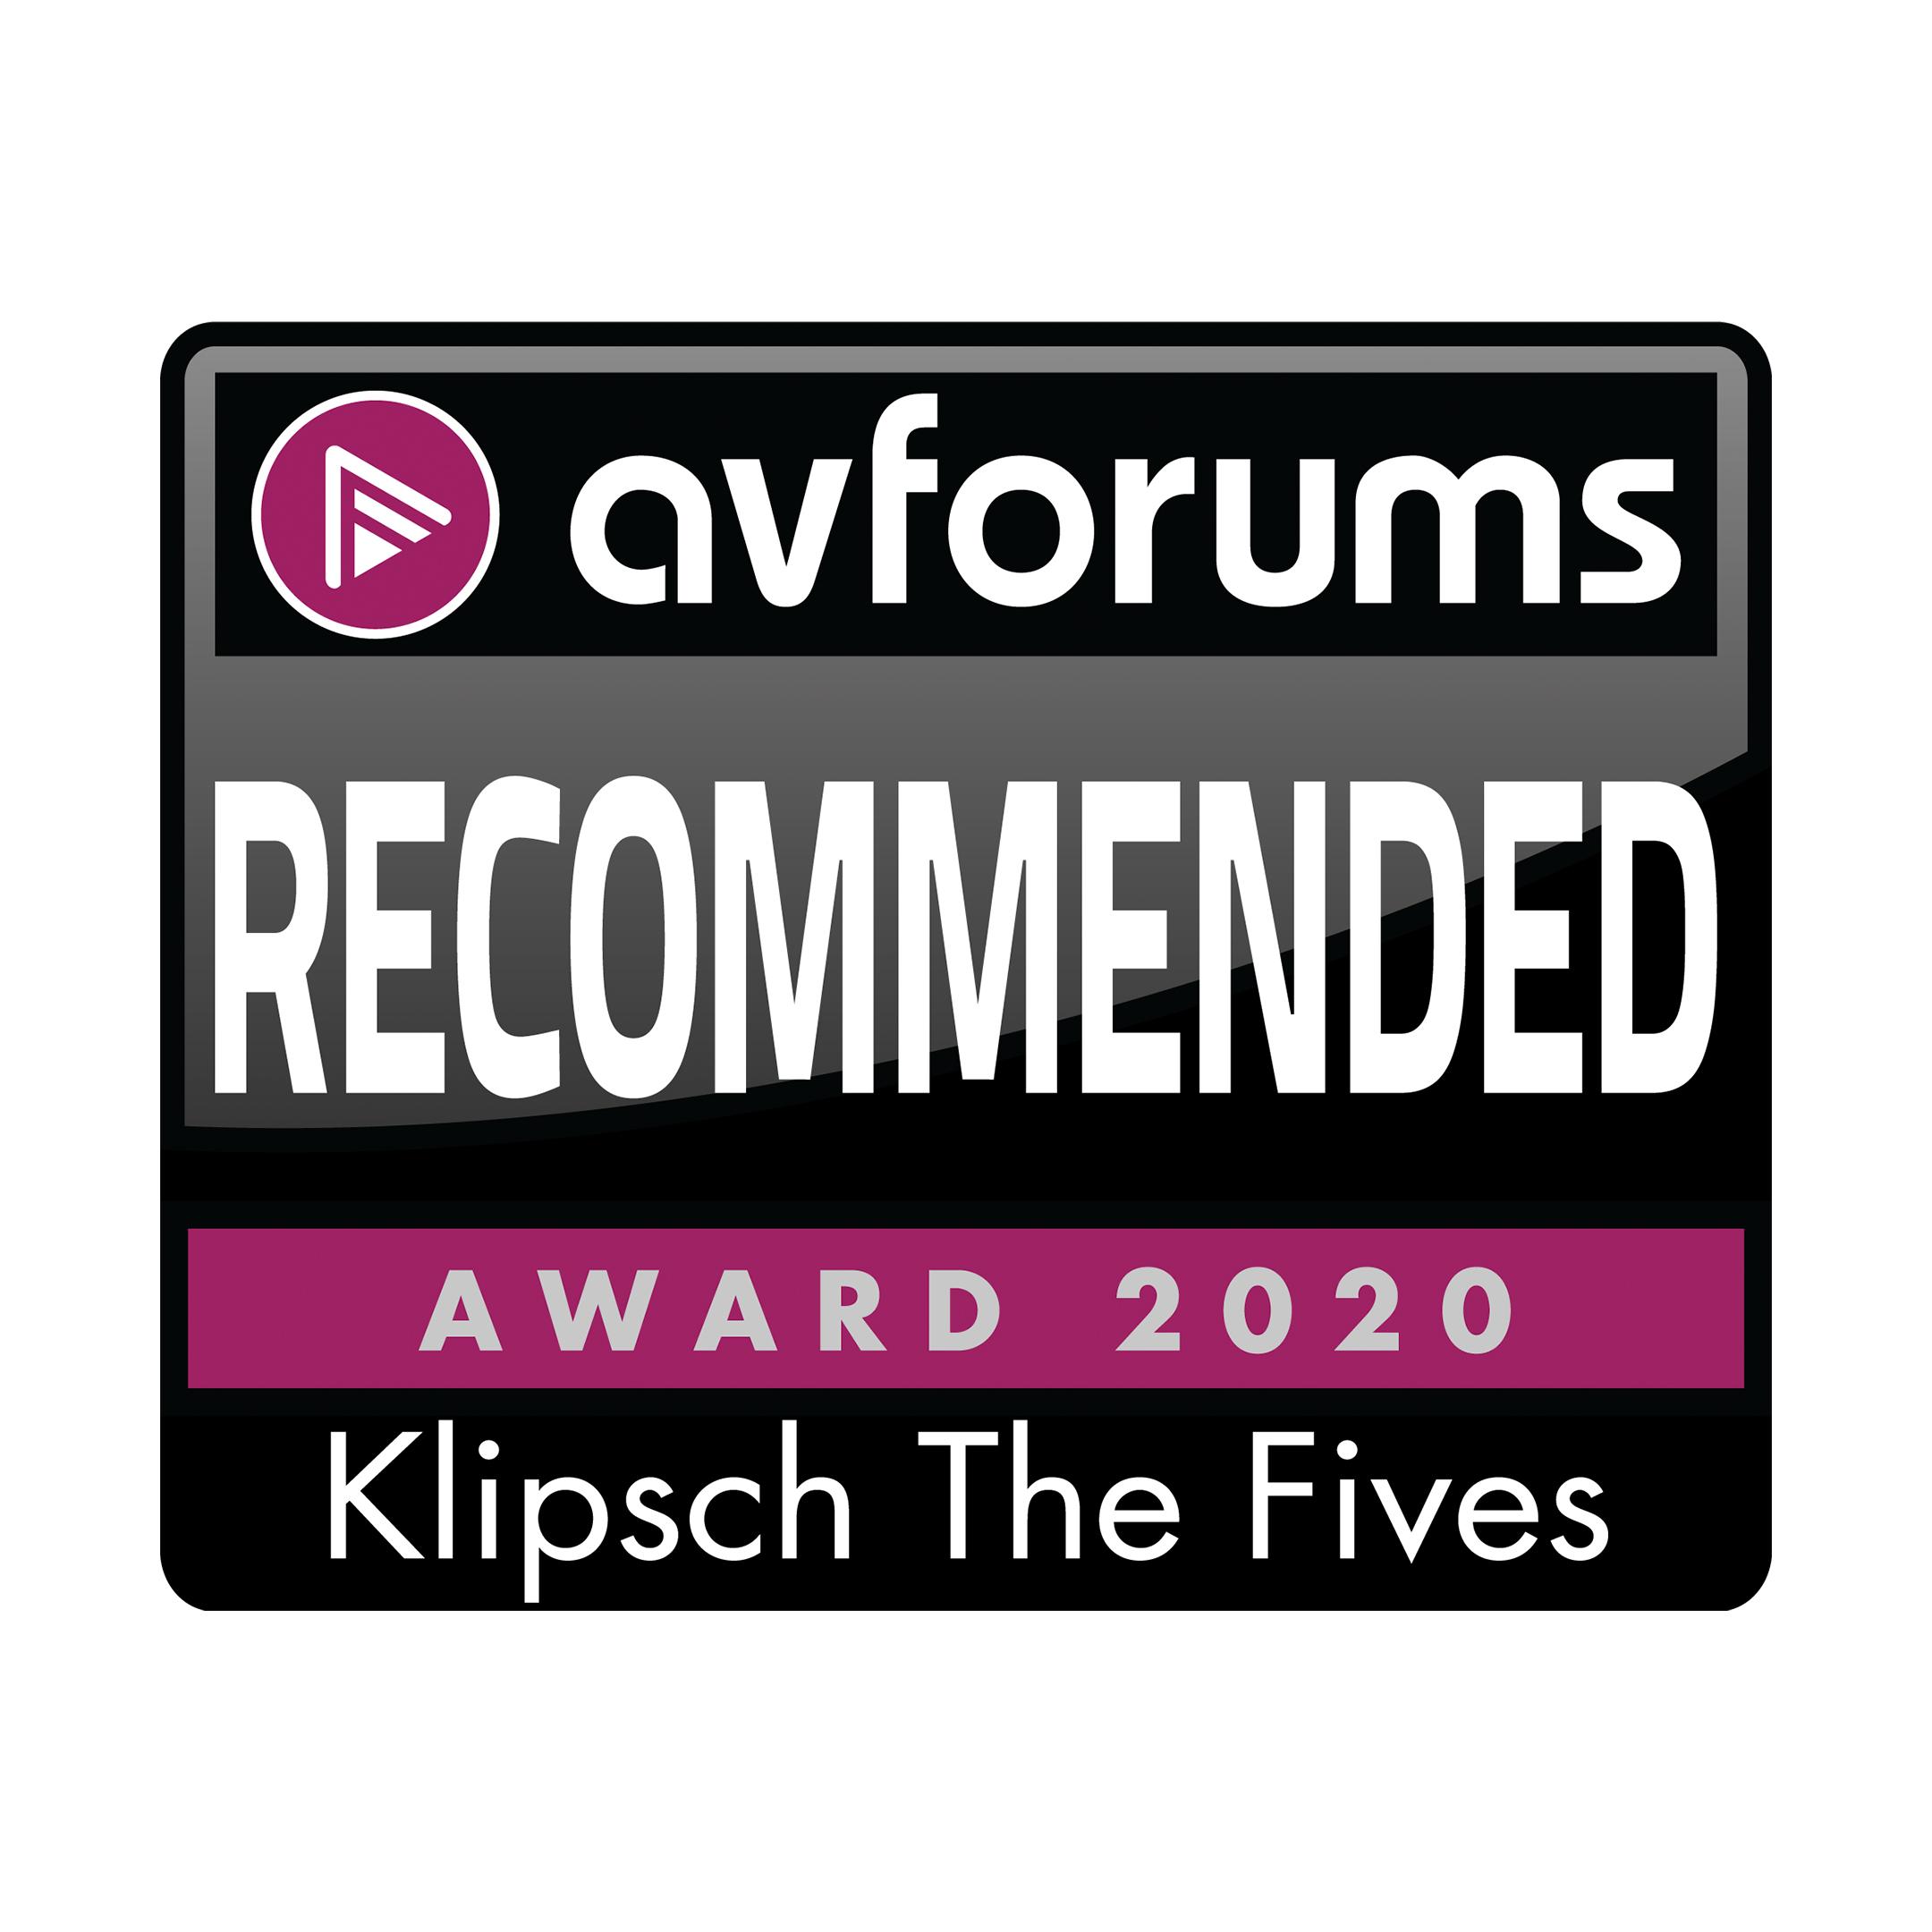 Klipsch The Fives, AV Forums, September 2020